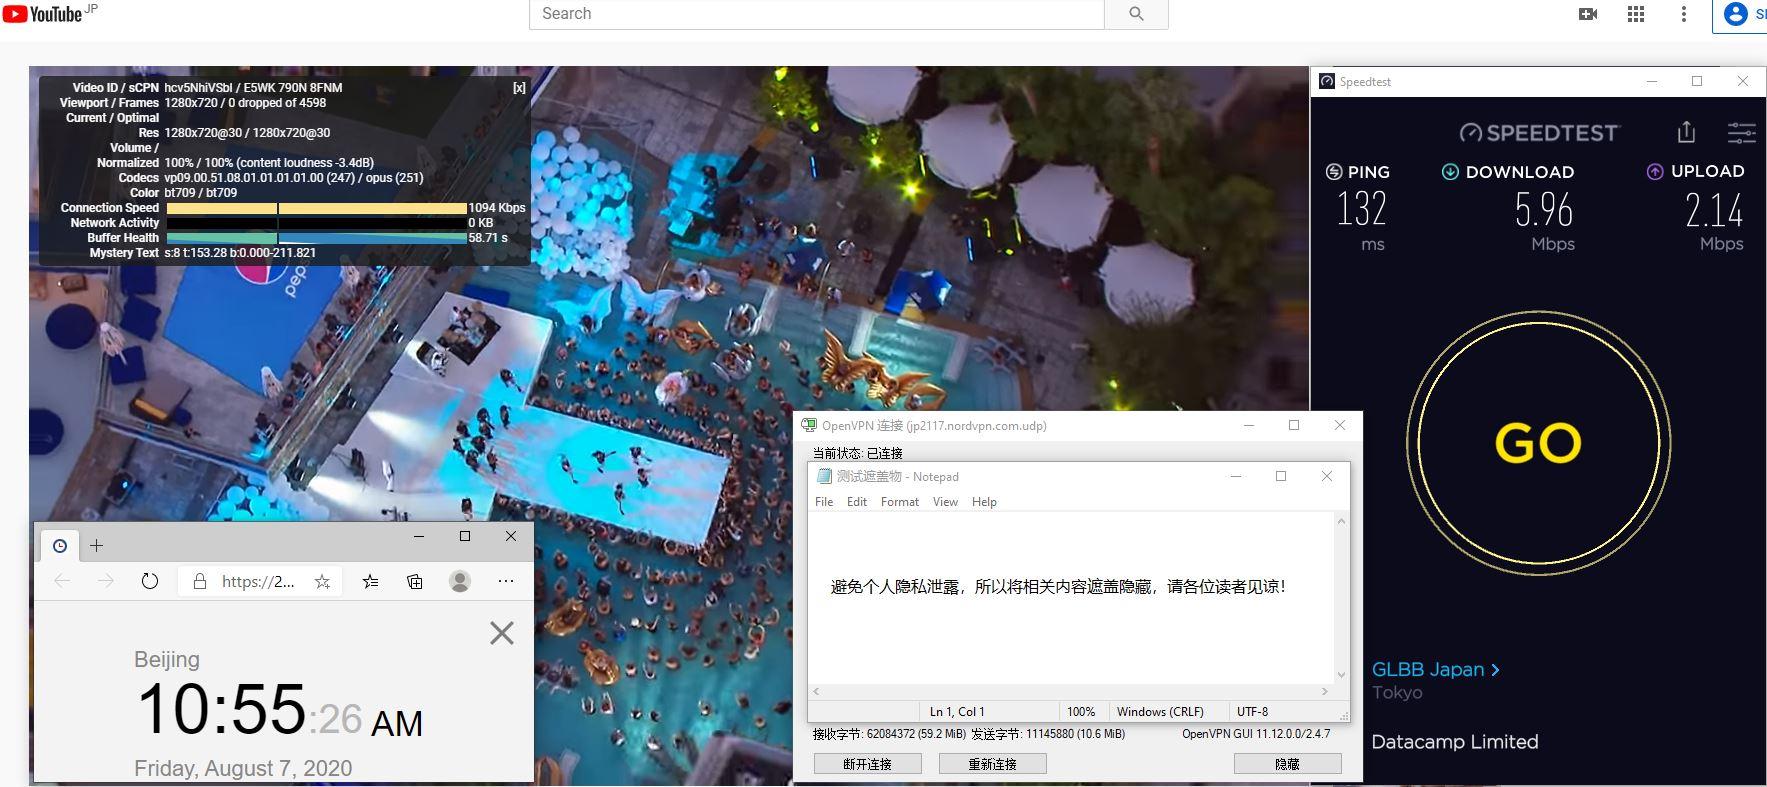 Windows10 NordVPN Open VPN GUI jp2117 中国VPN 翻墙 科学上网 翻墙速度测试 - 20200807